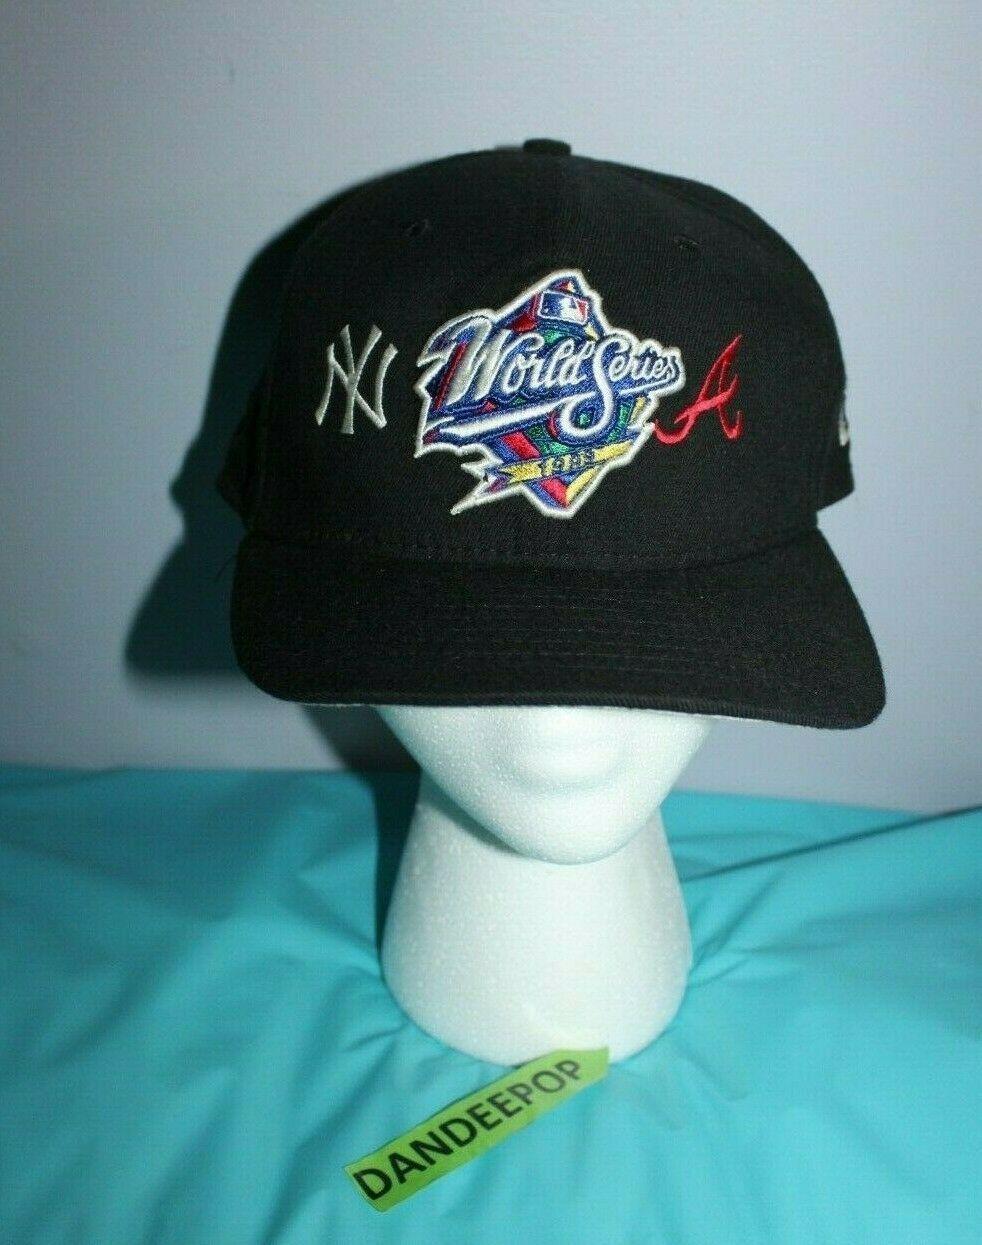 New York Yankees Atlanta Braves World Series 1998 New Era Mlb Baseball Hat Cap Atlanta Braves World Series Atlanta Braves New York Yankees